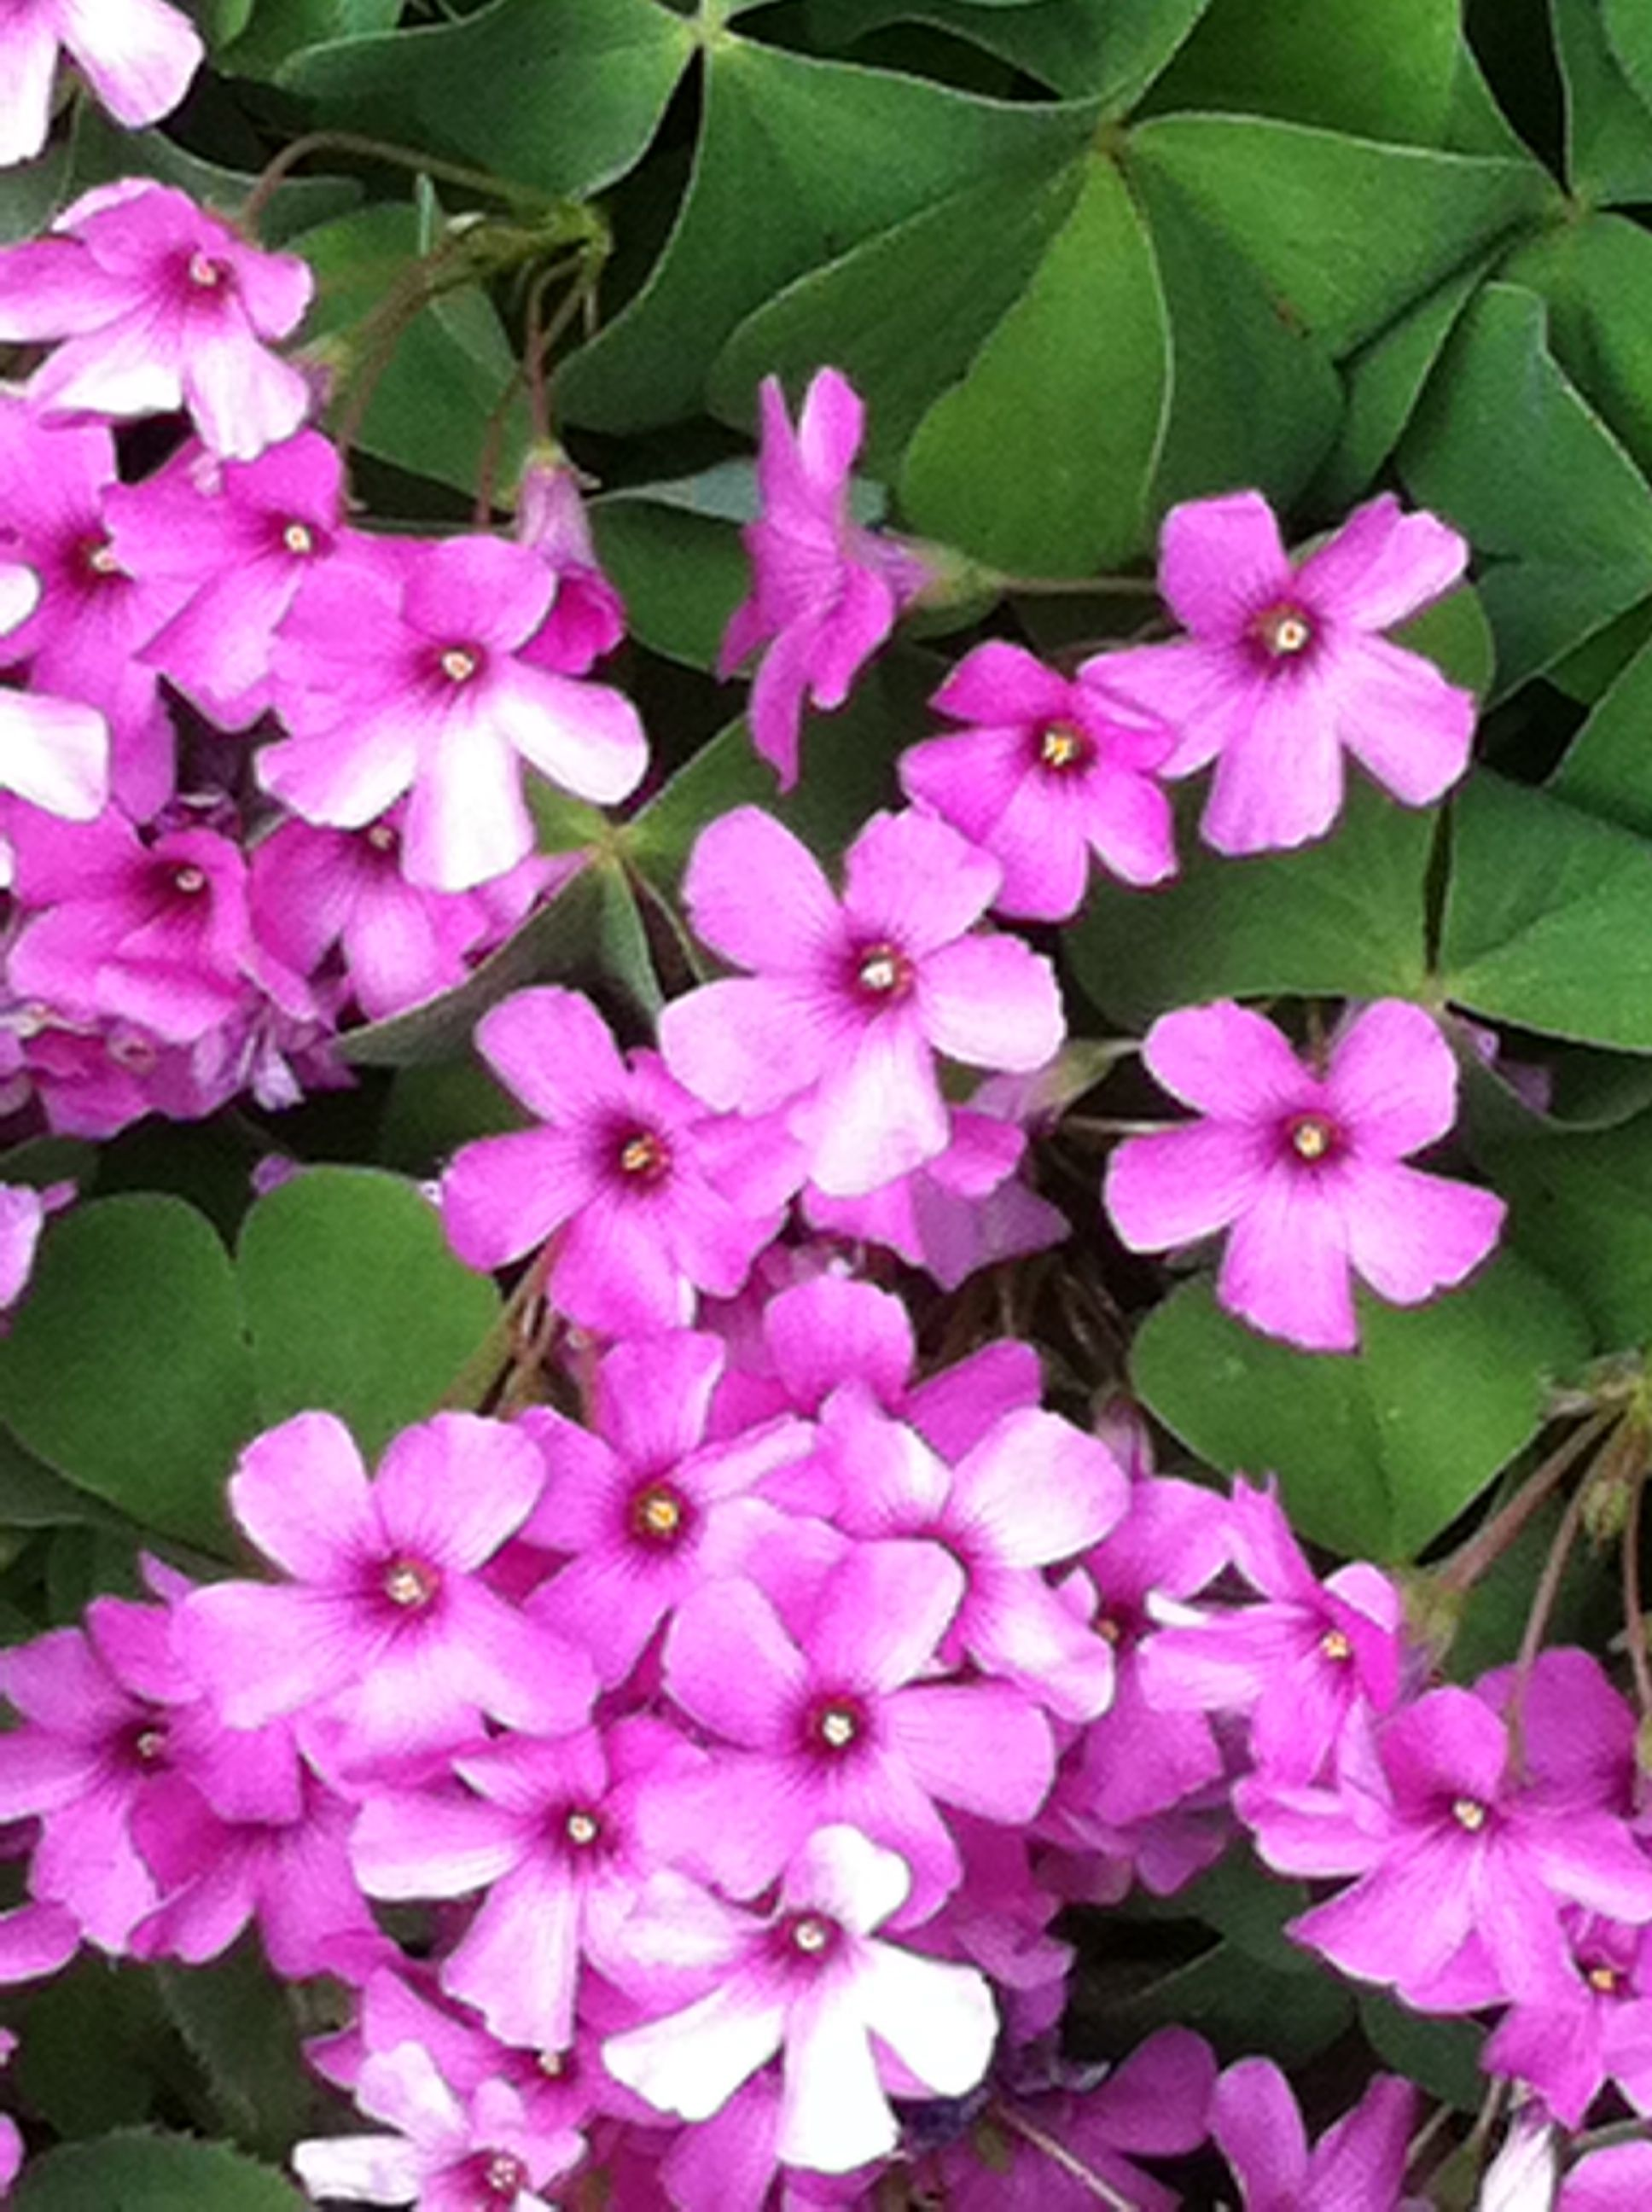 Fiori Quadrifoglio.Quadrifoglio Fiori Plants Garden